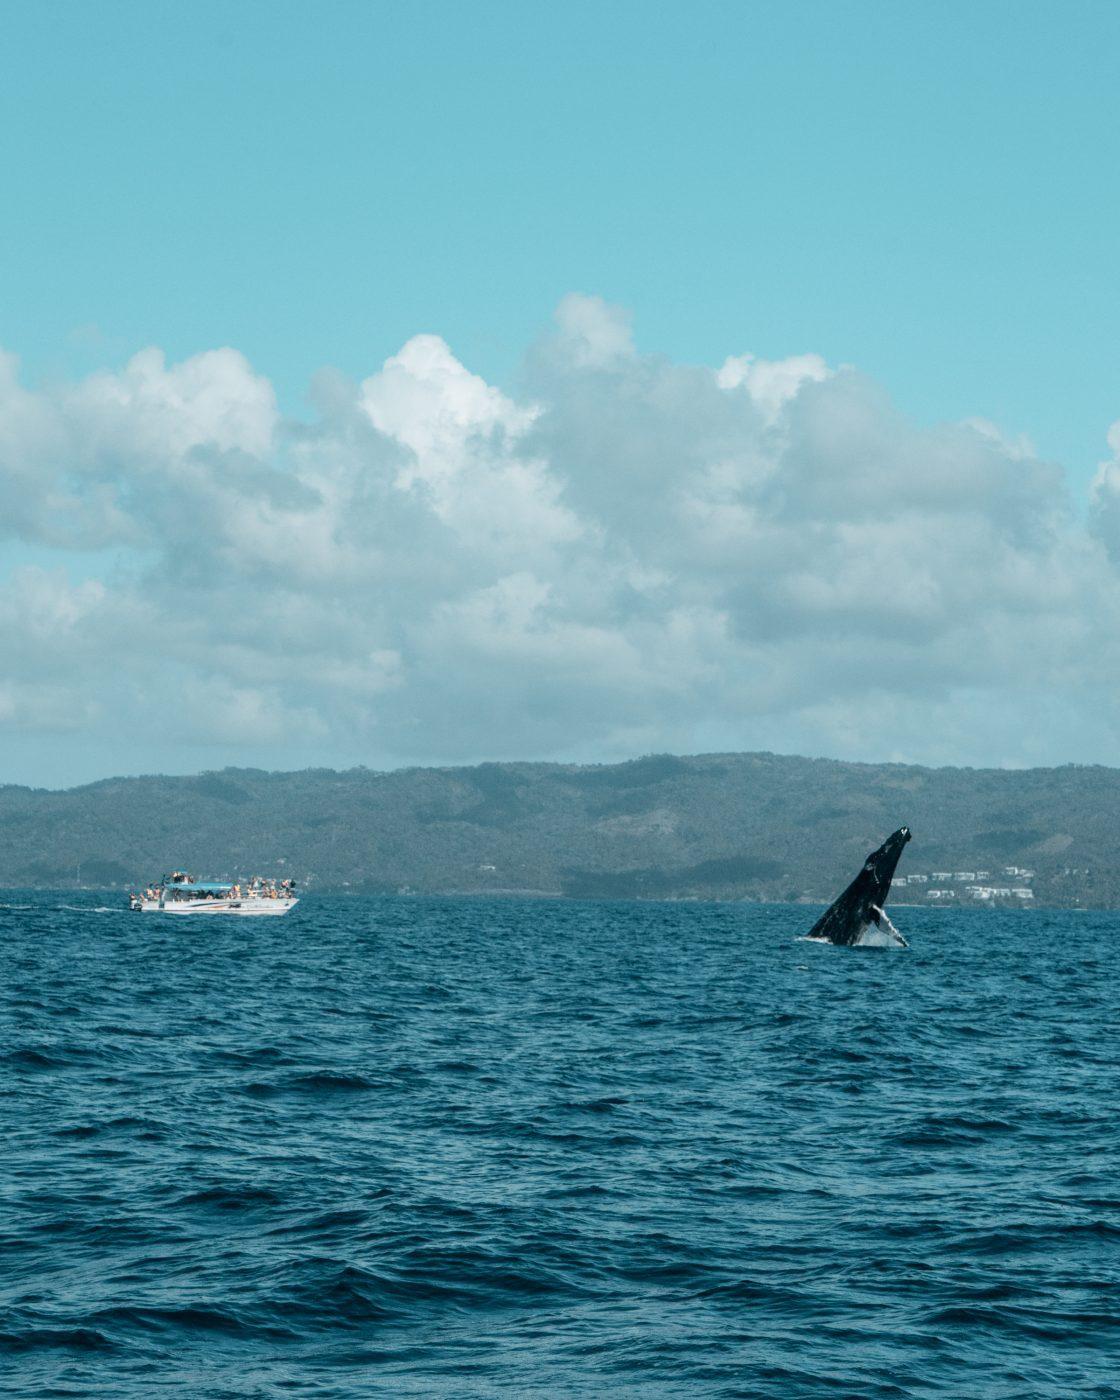 whale watching safari in Samana bay, Dominican Republic